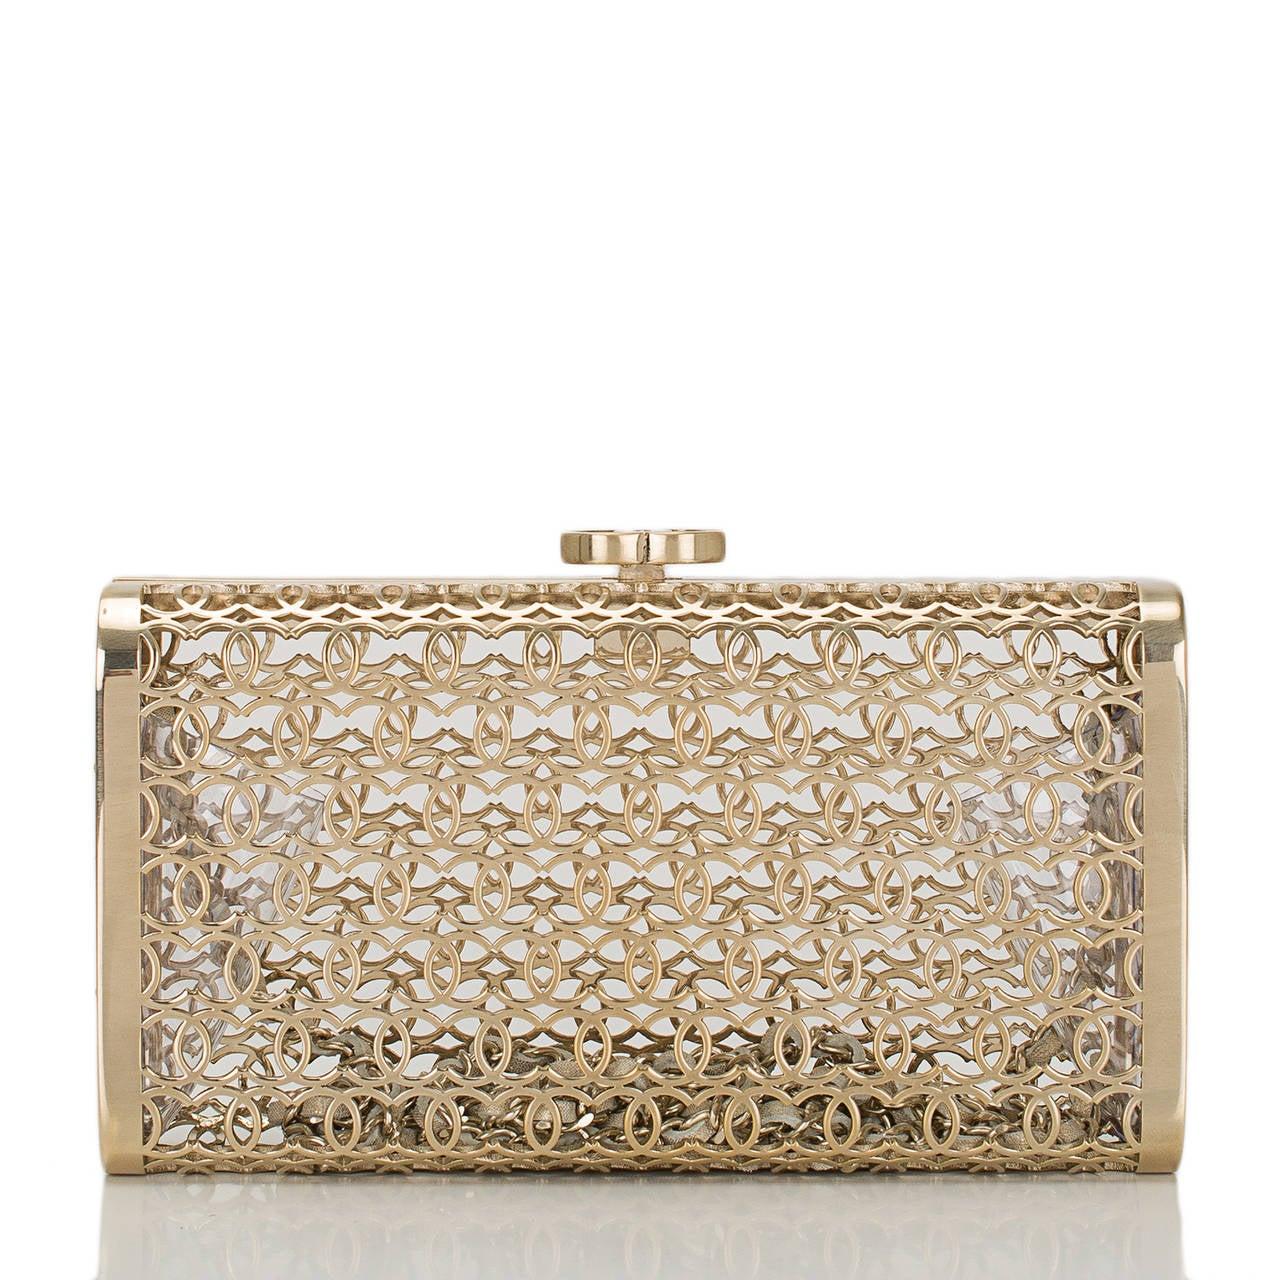 Beige Chanel Metal Moucharabieh Minaudiere Bag For Sale